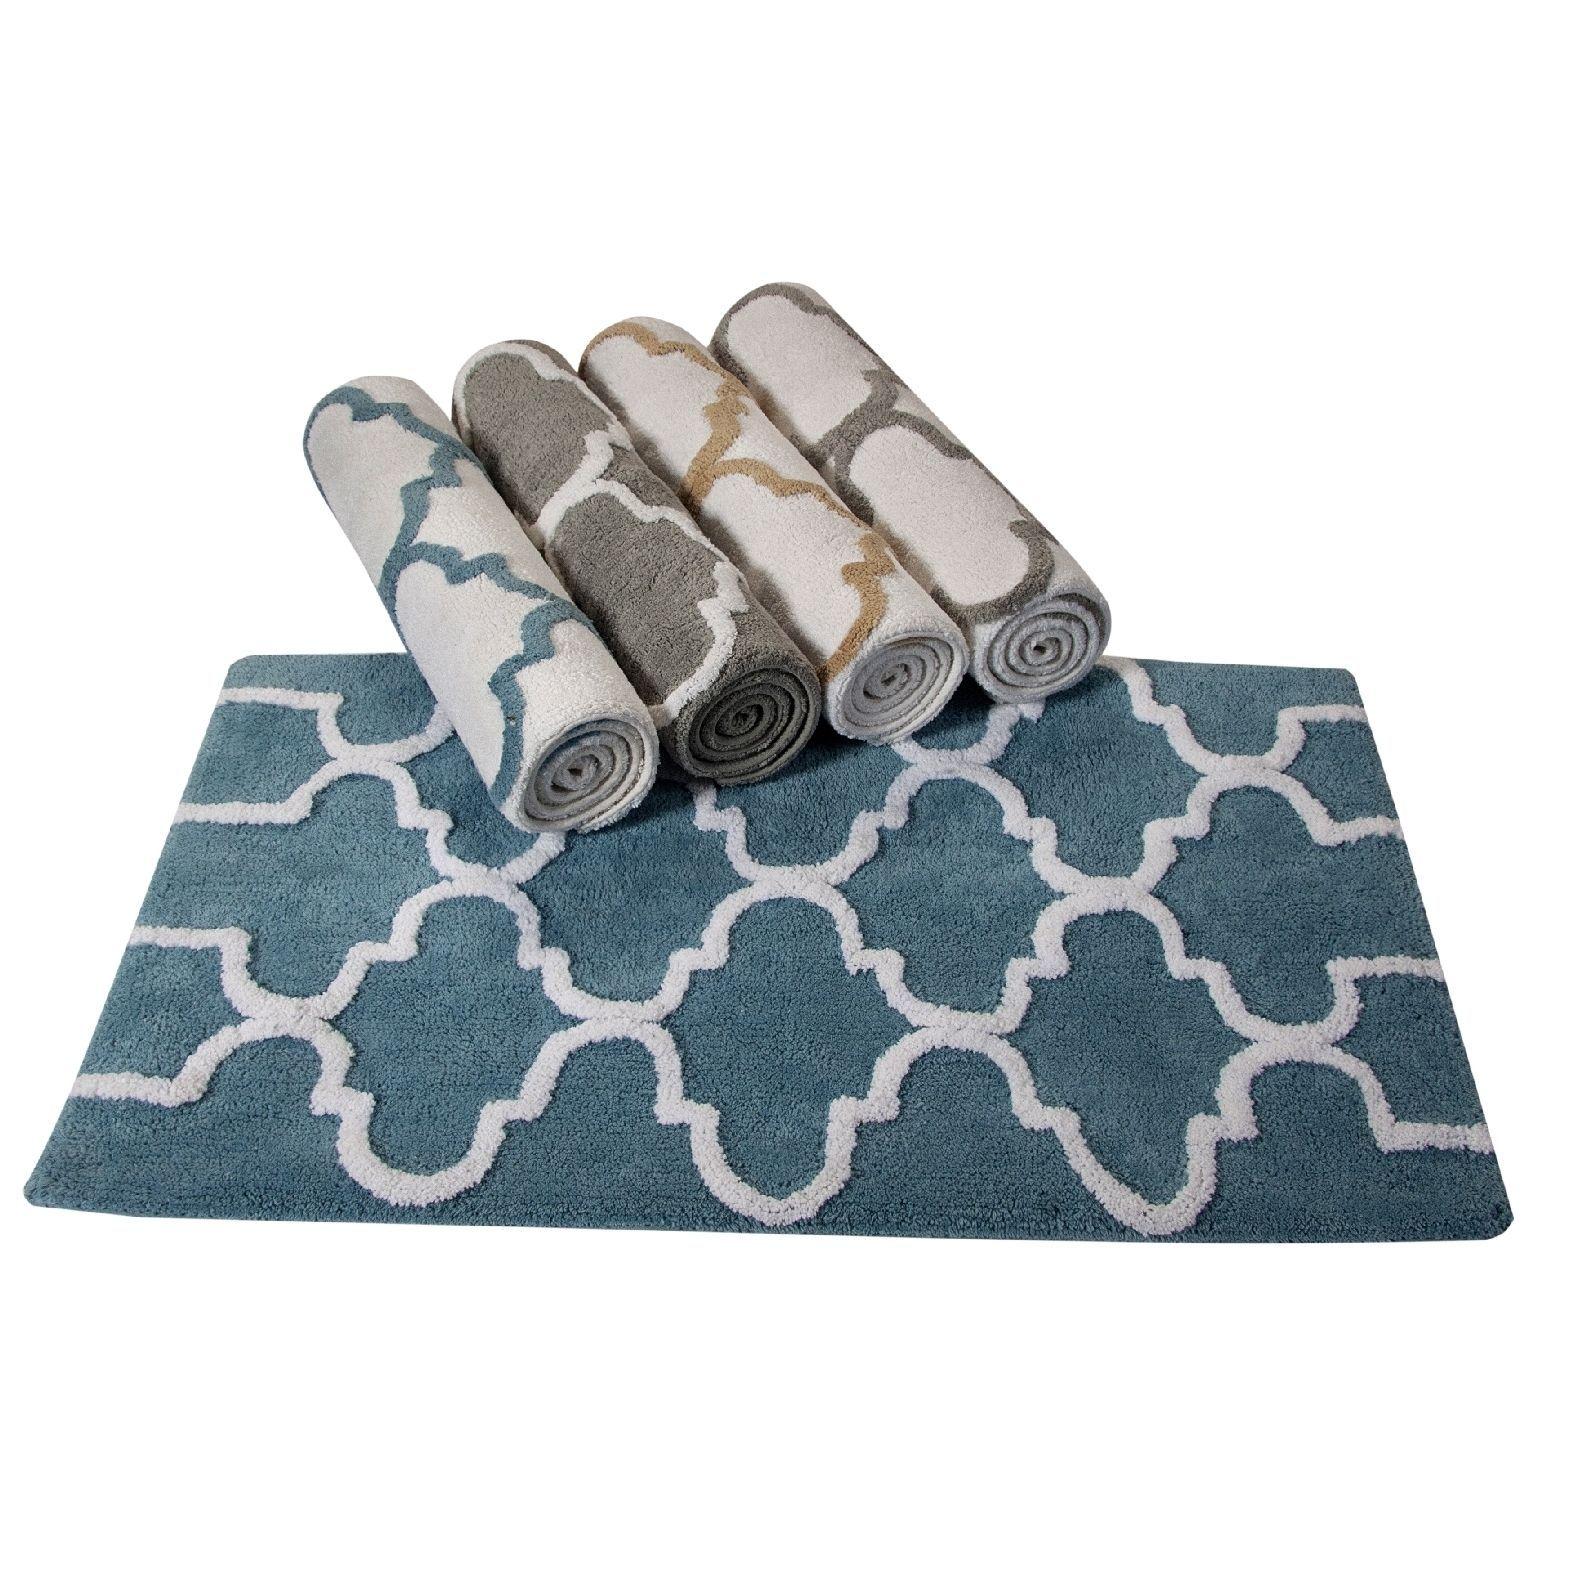 Saffron Fabs Cotton Geometrics Bath Rug | Grey and beige, Grey and ...